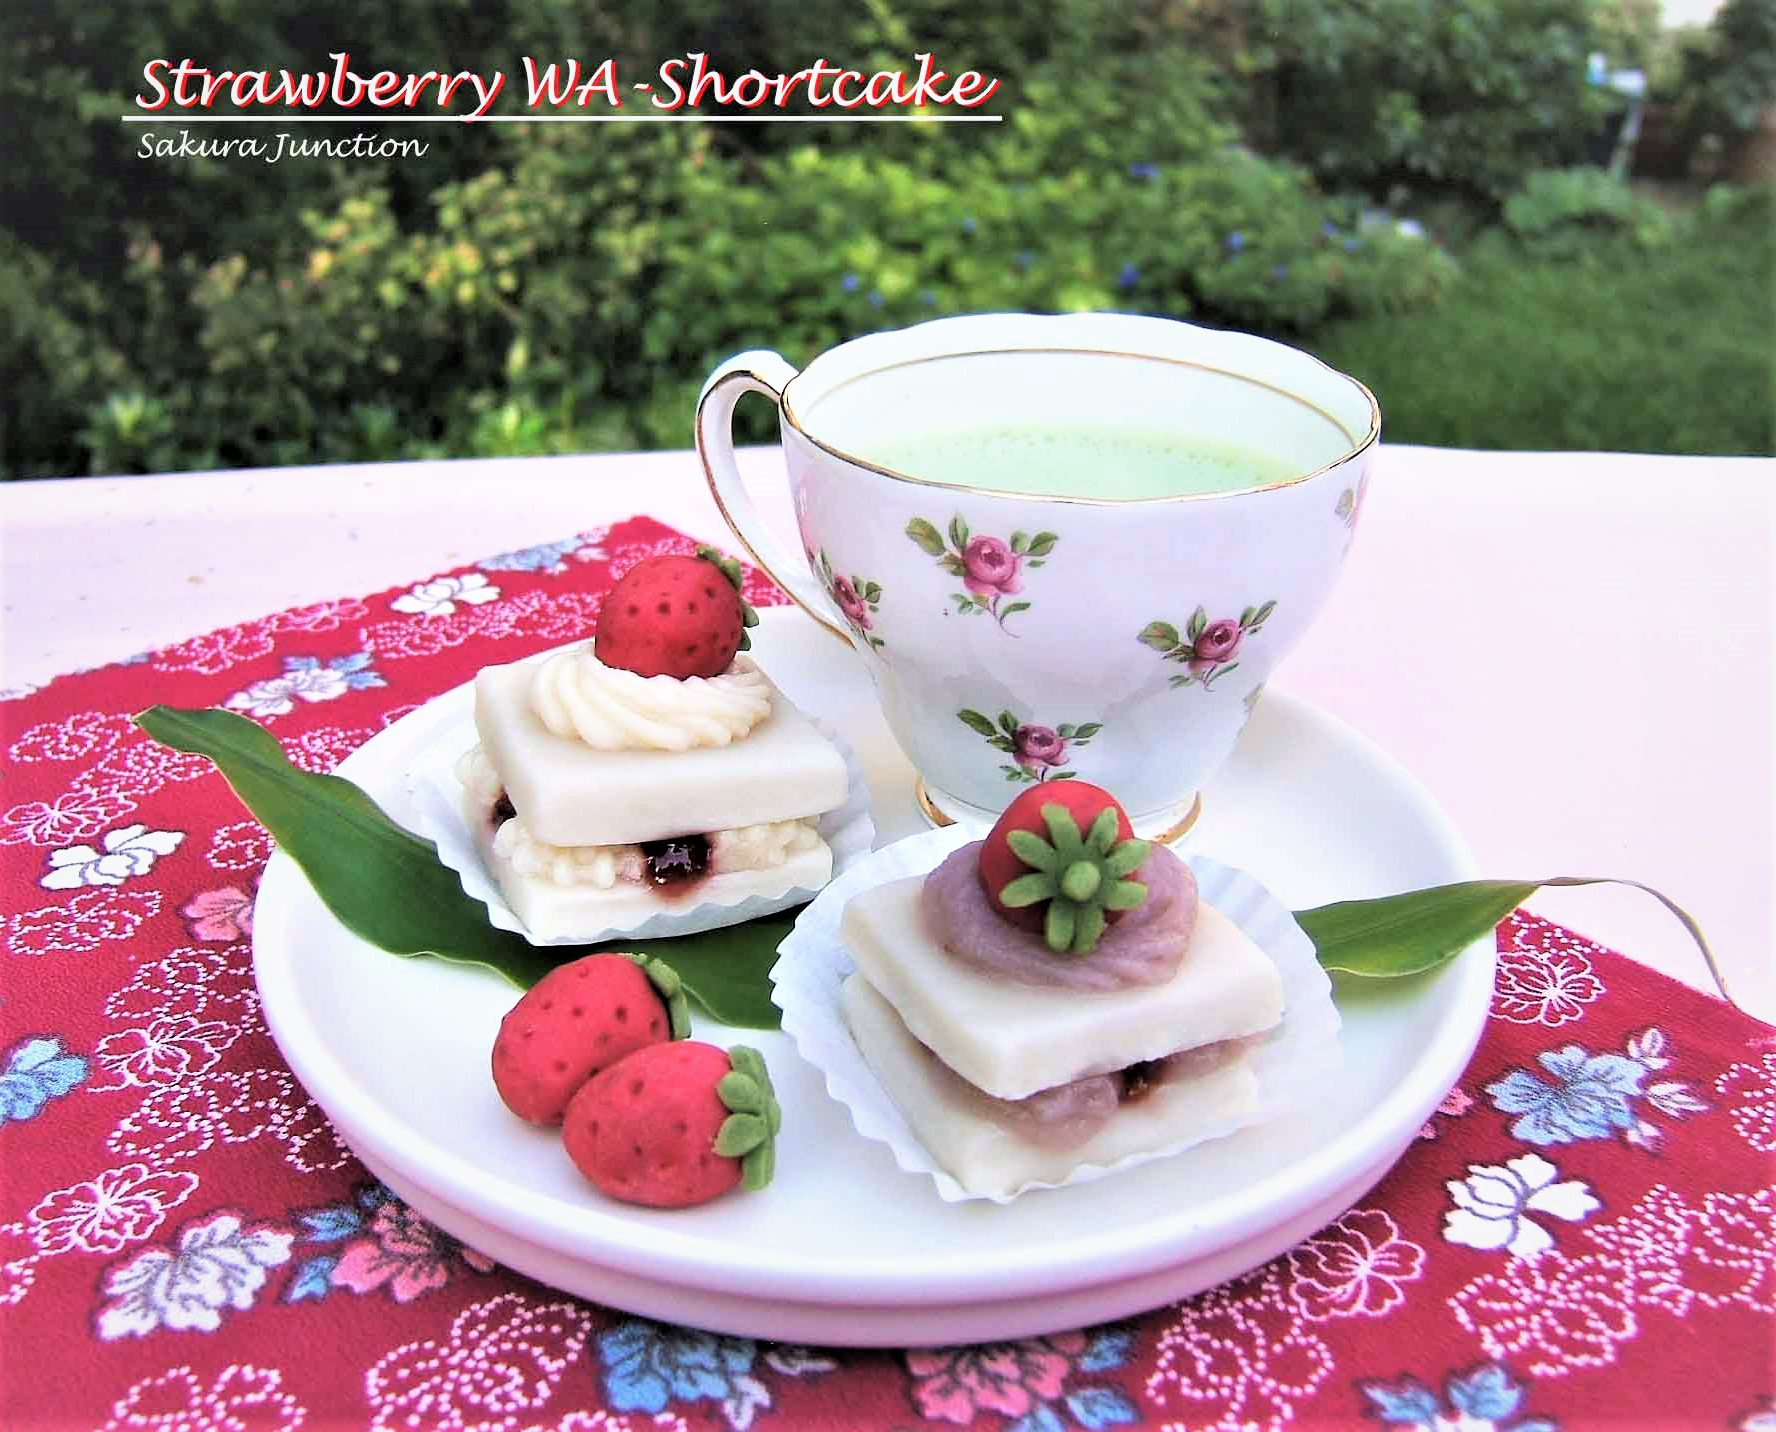 Wa-shortcake7